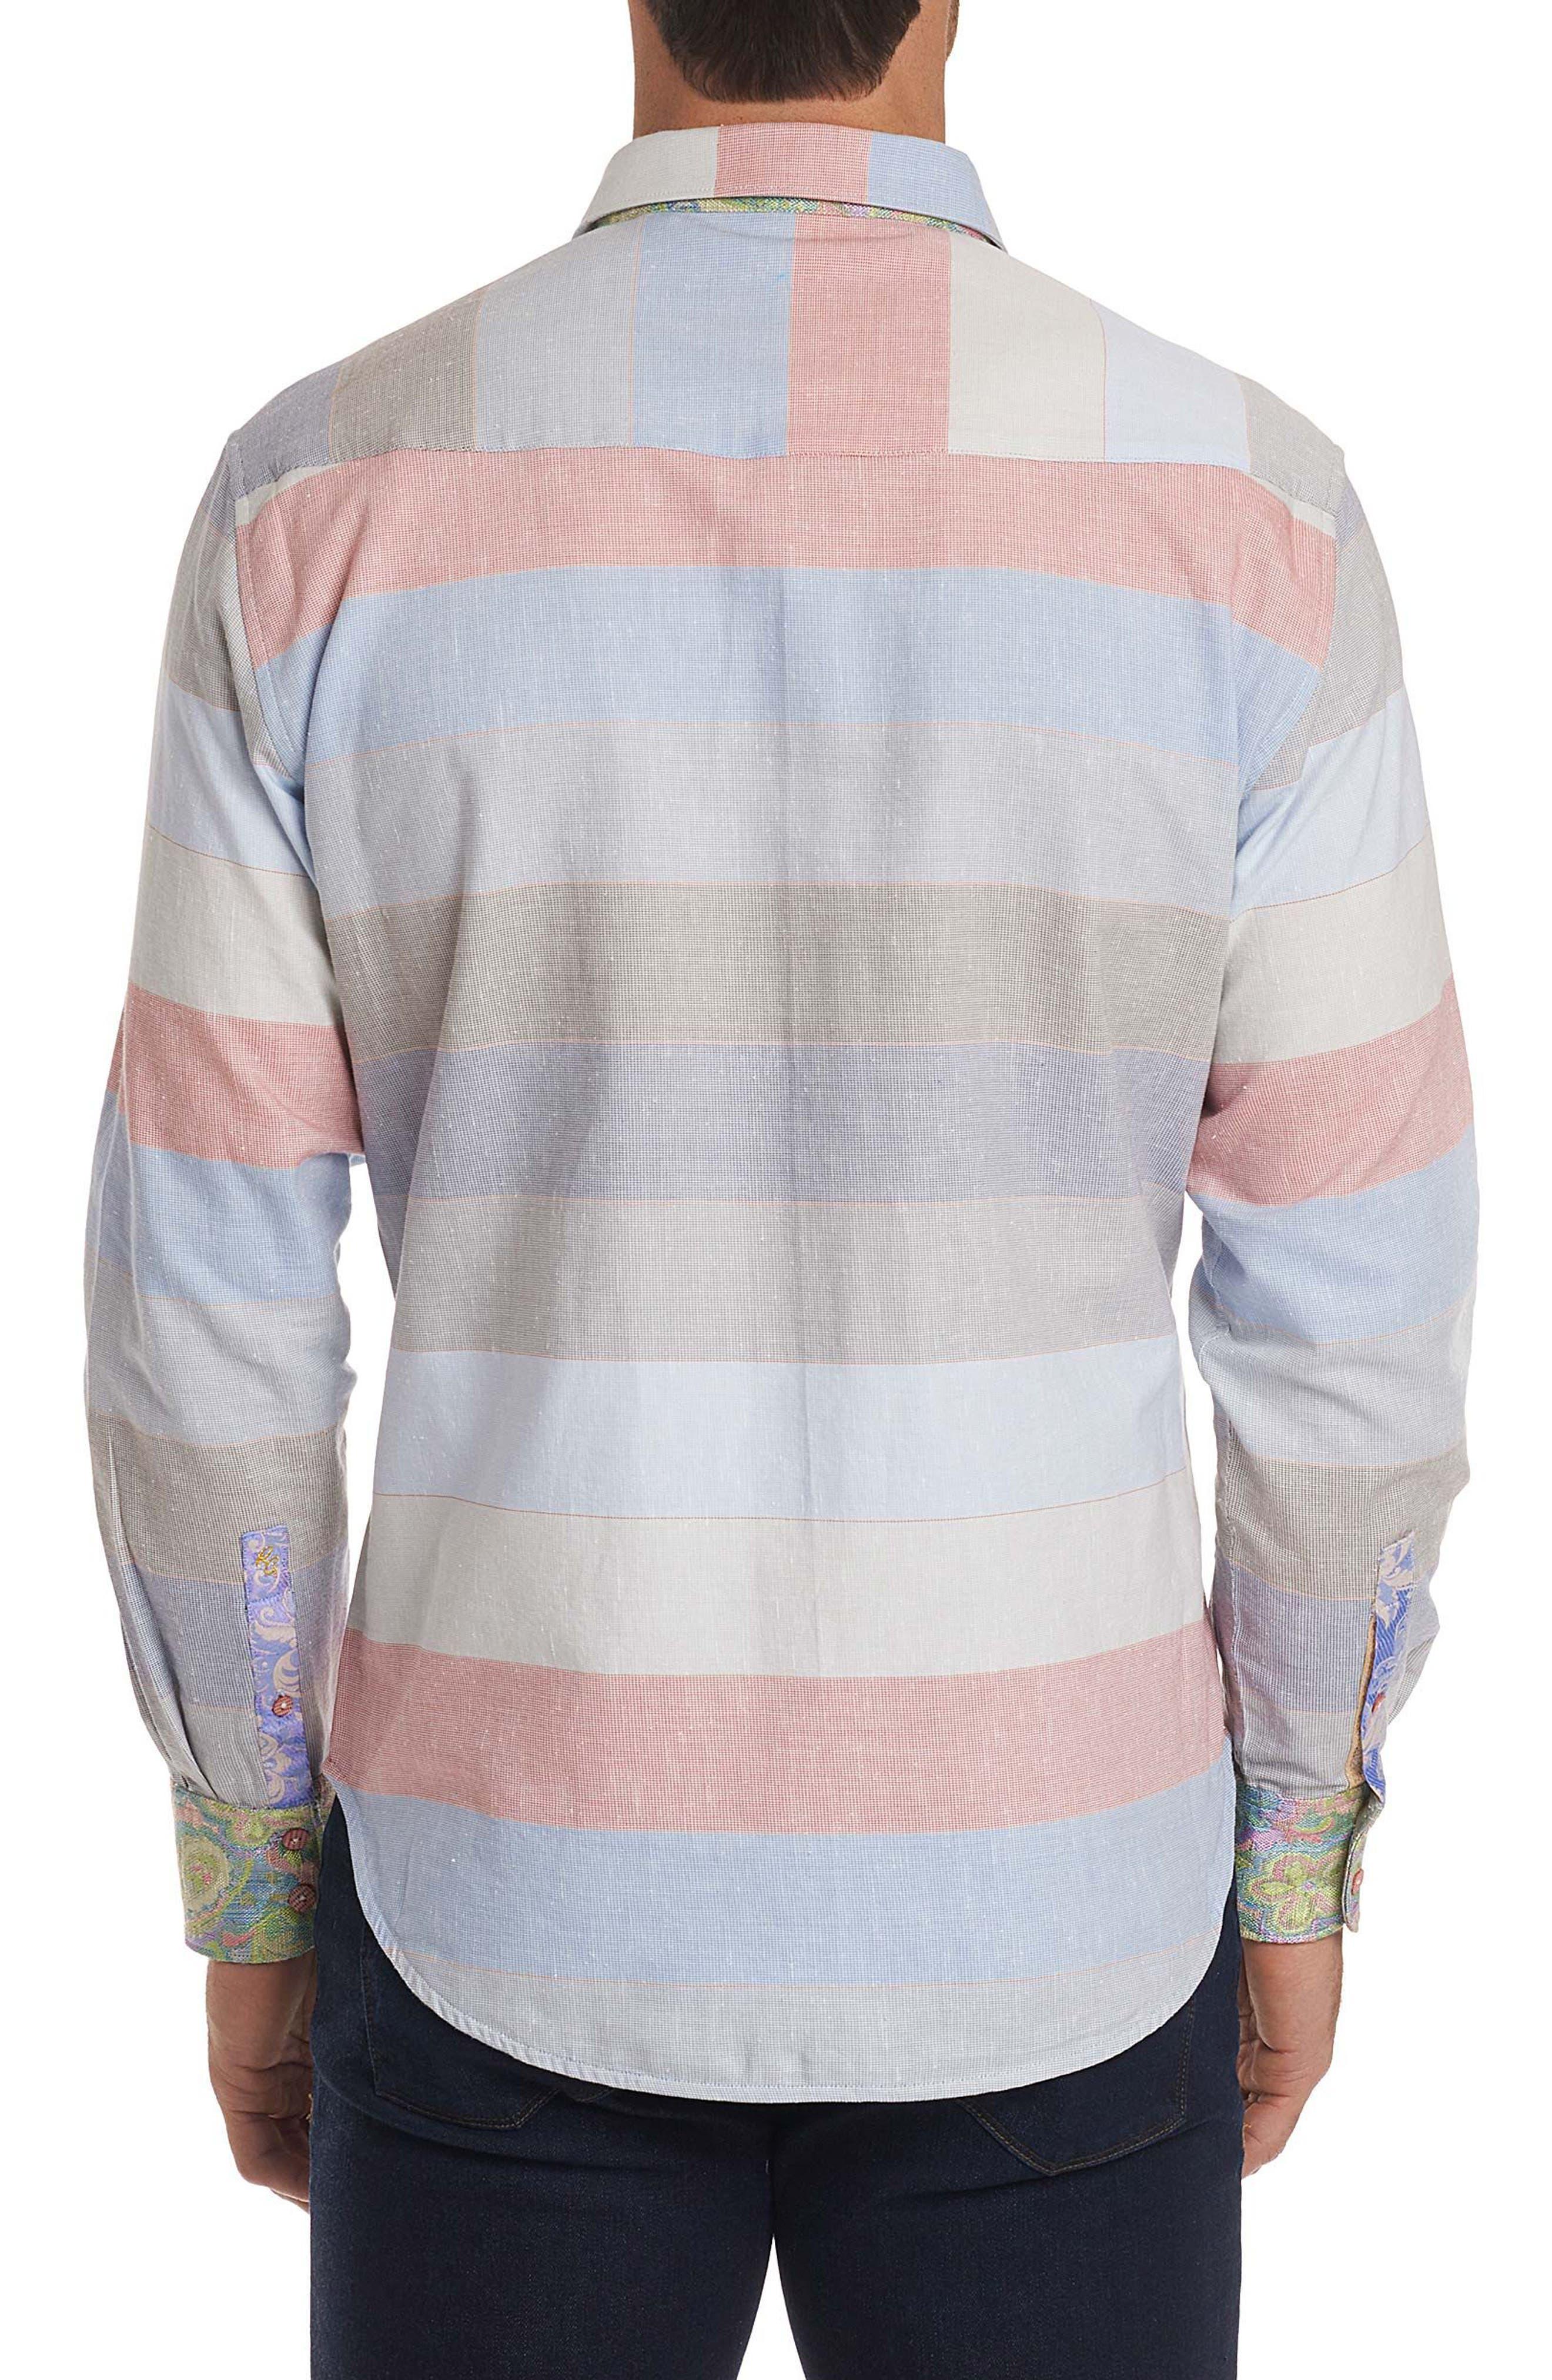 Denim Rays Limited Edition Sport Shirt,                             Alternate thumbnail 2, color,                             400